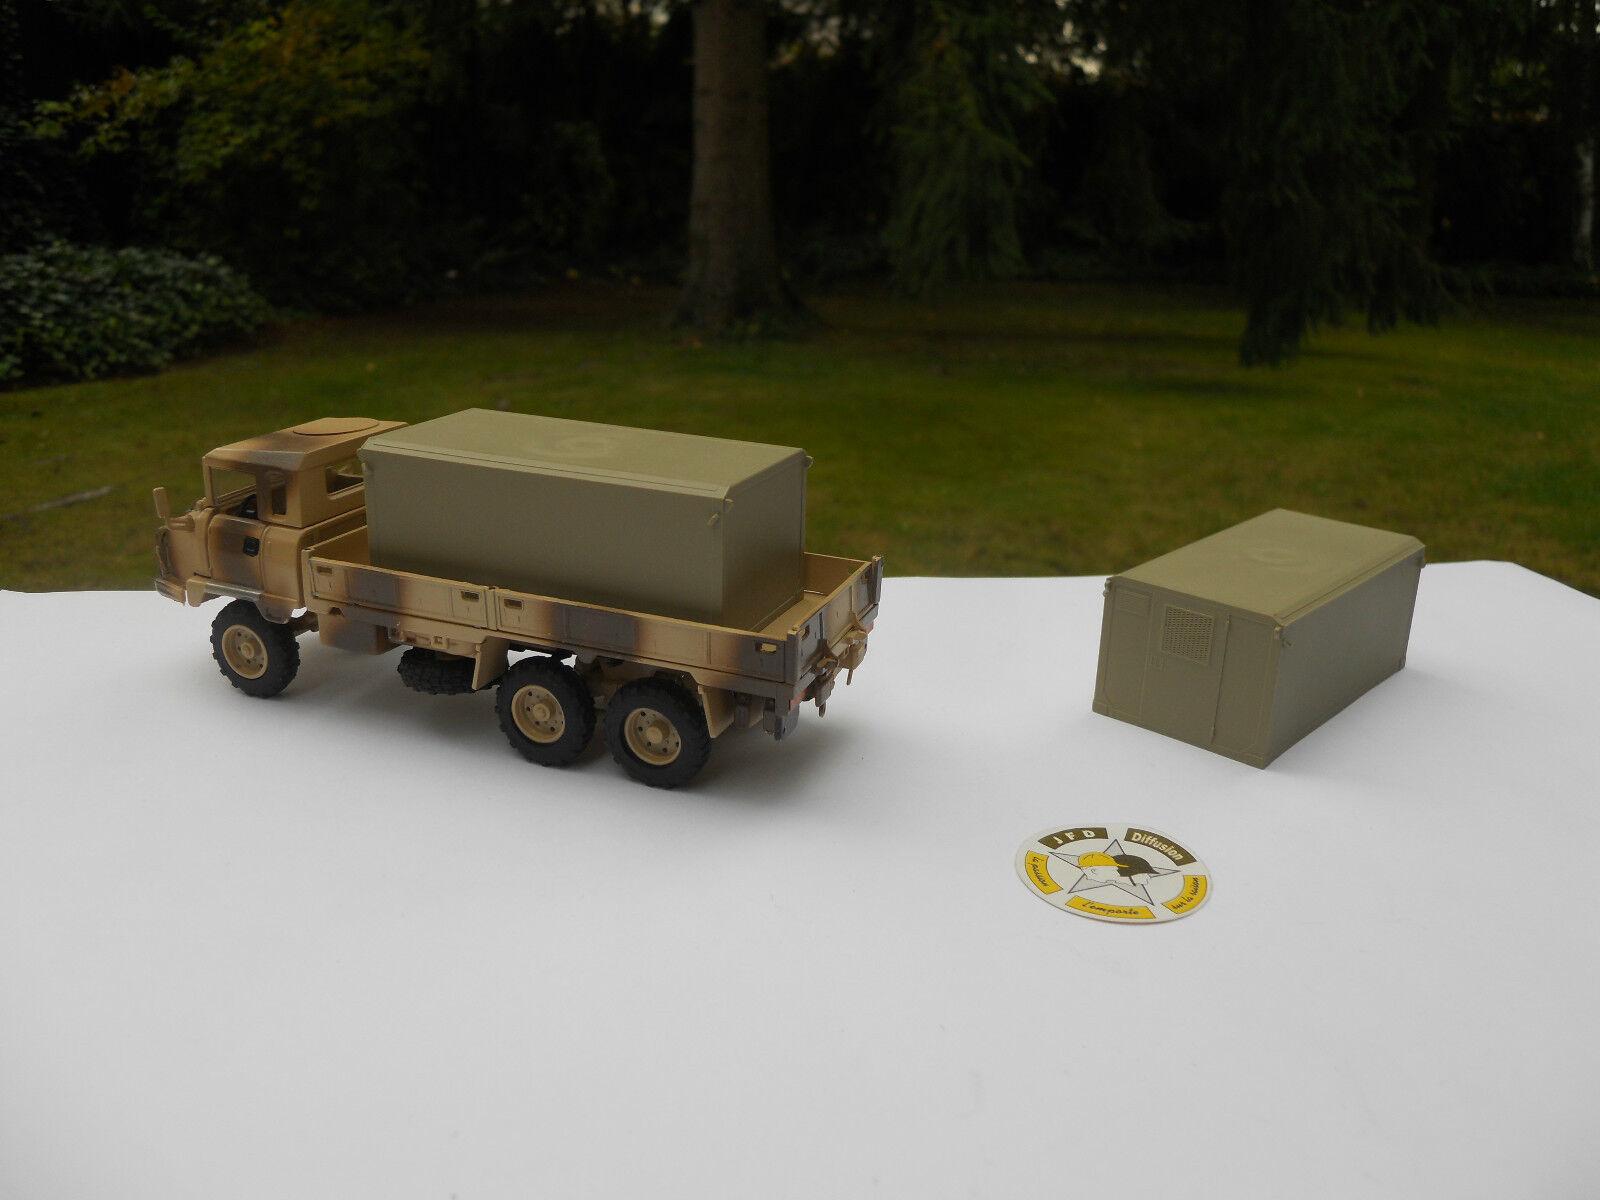 ACMAT 1 50 ACCESSOIRE RESINE SHELTER SH 385 A 75 mm X 38 mm X 32 mm